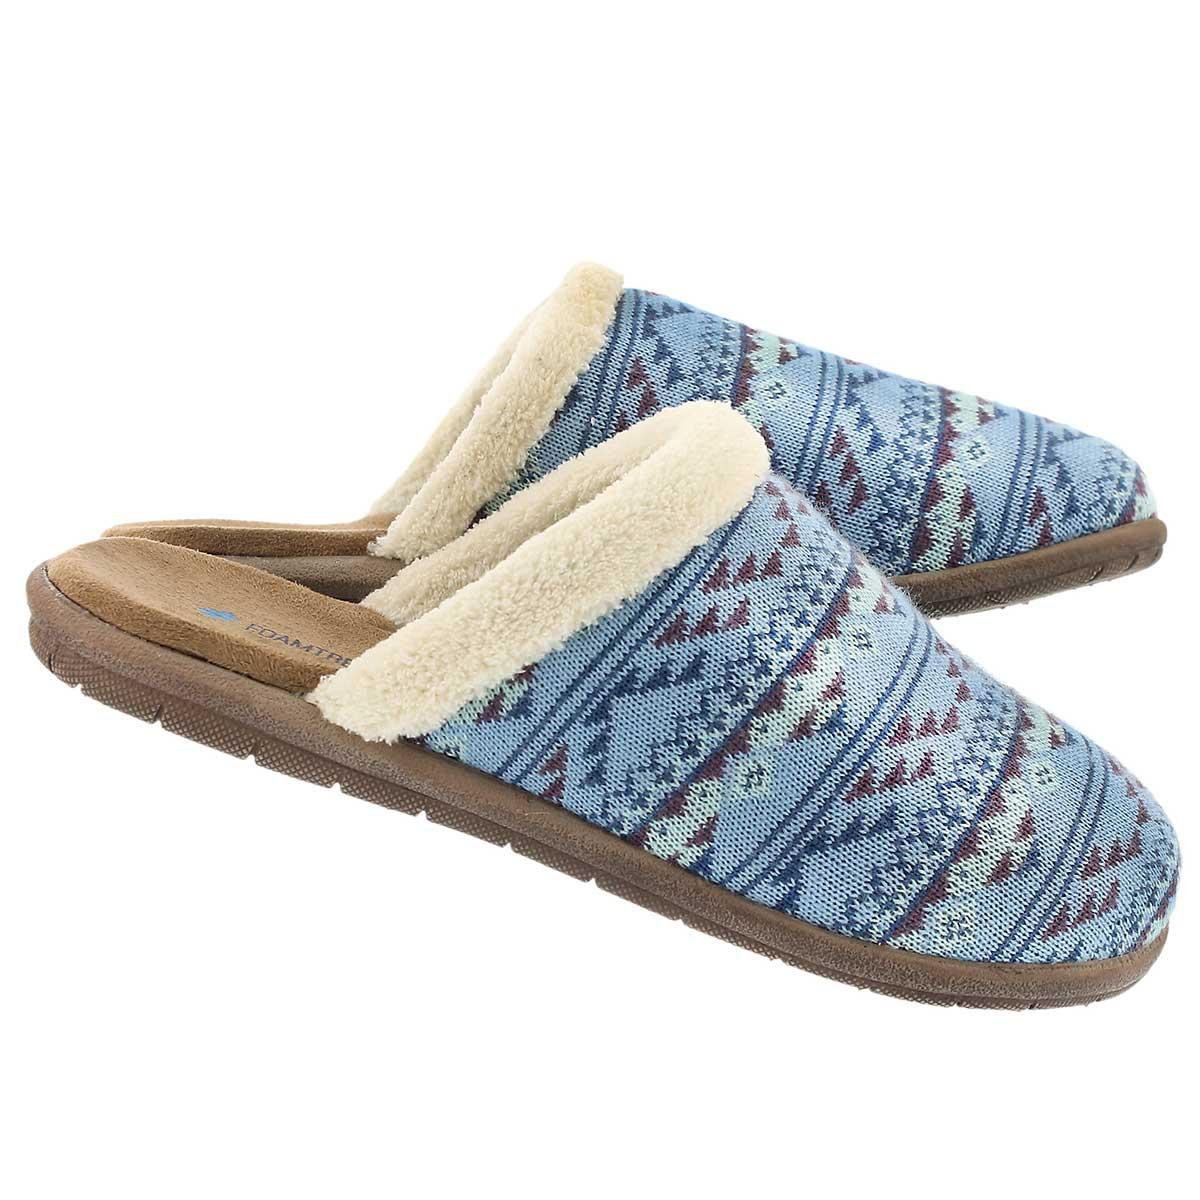 Pantoufles Hazel, bleu ciel, fem